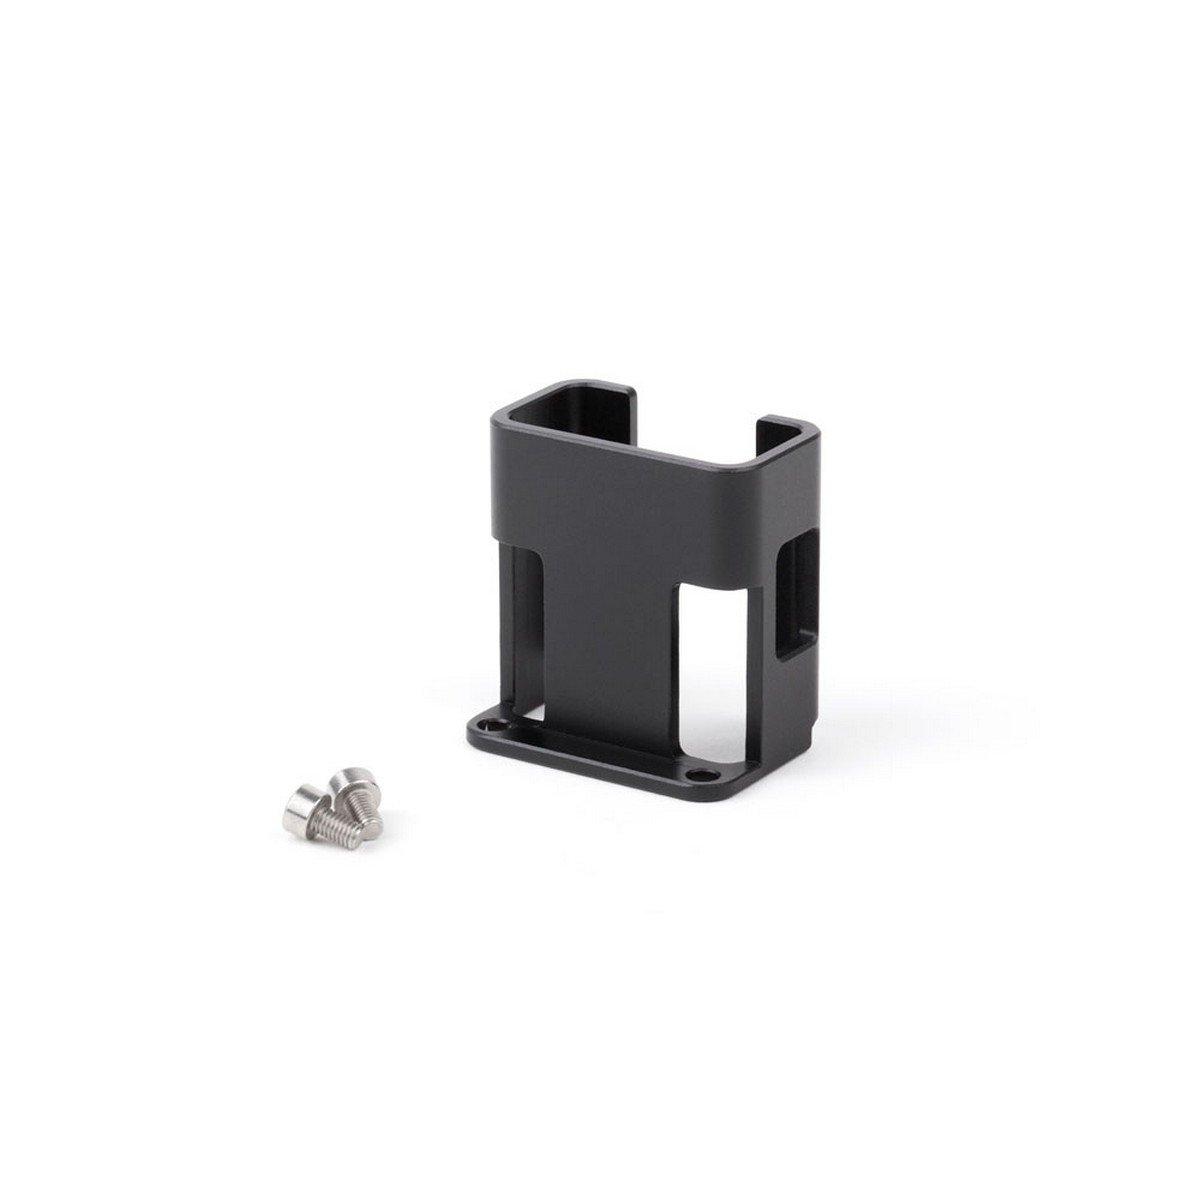 Wooden Camera 183700   C Box Wireless HDMI Protector